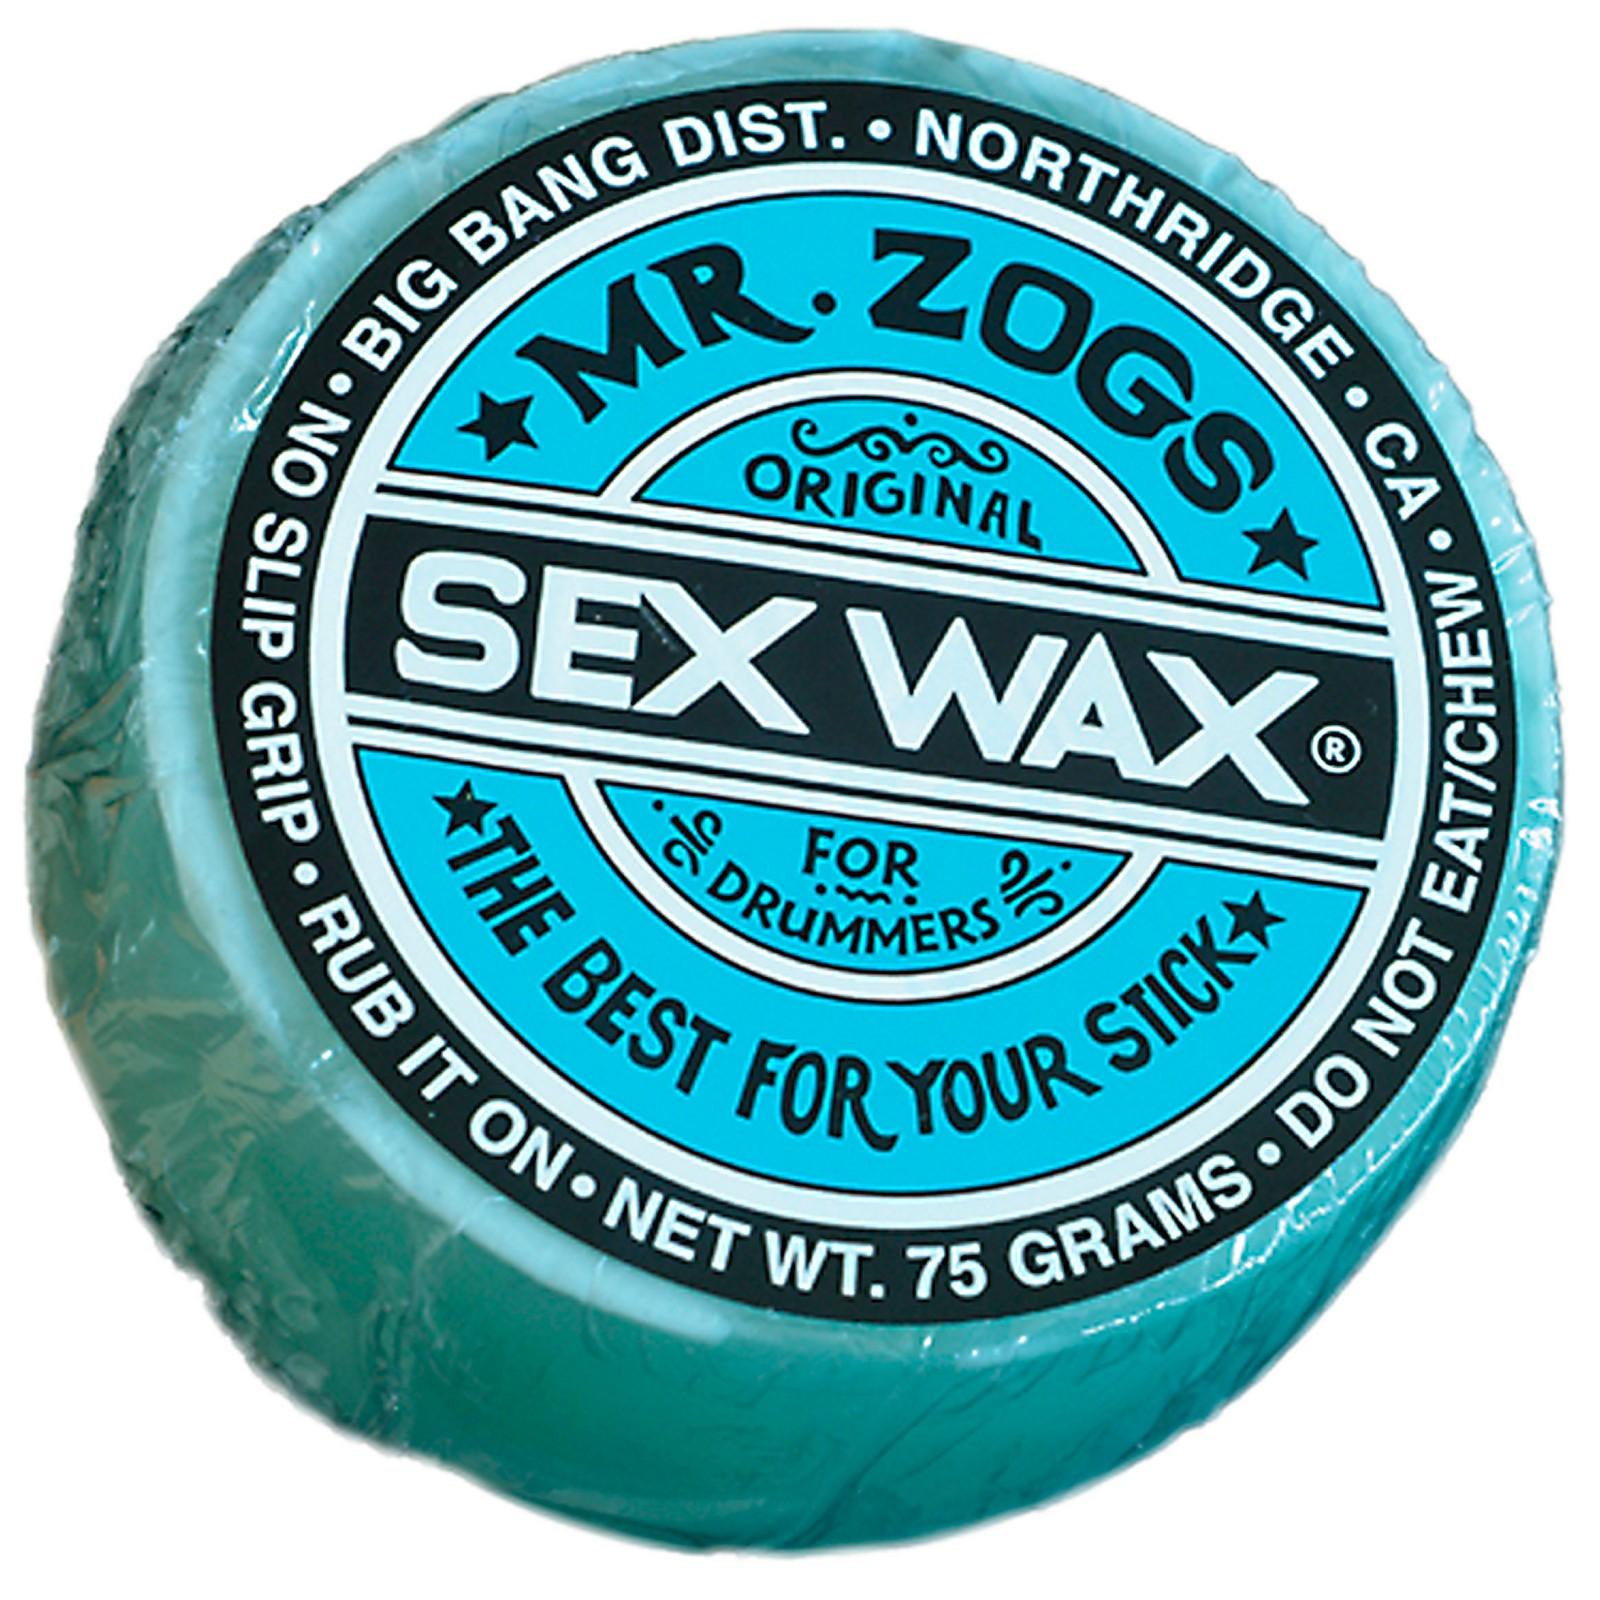 Big Bang Distribution Sex Wax-Drumstick Wax